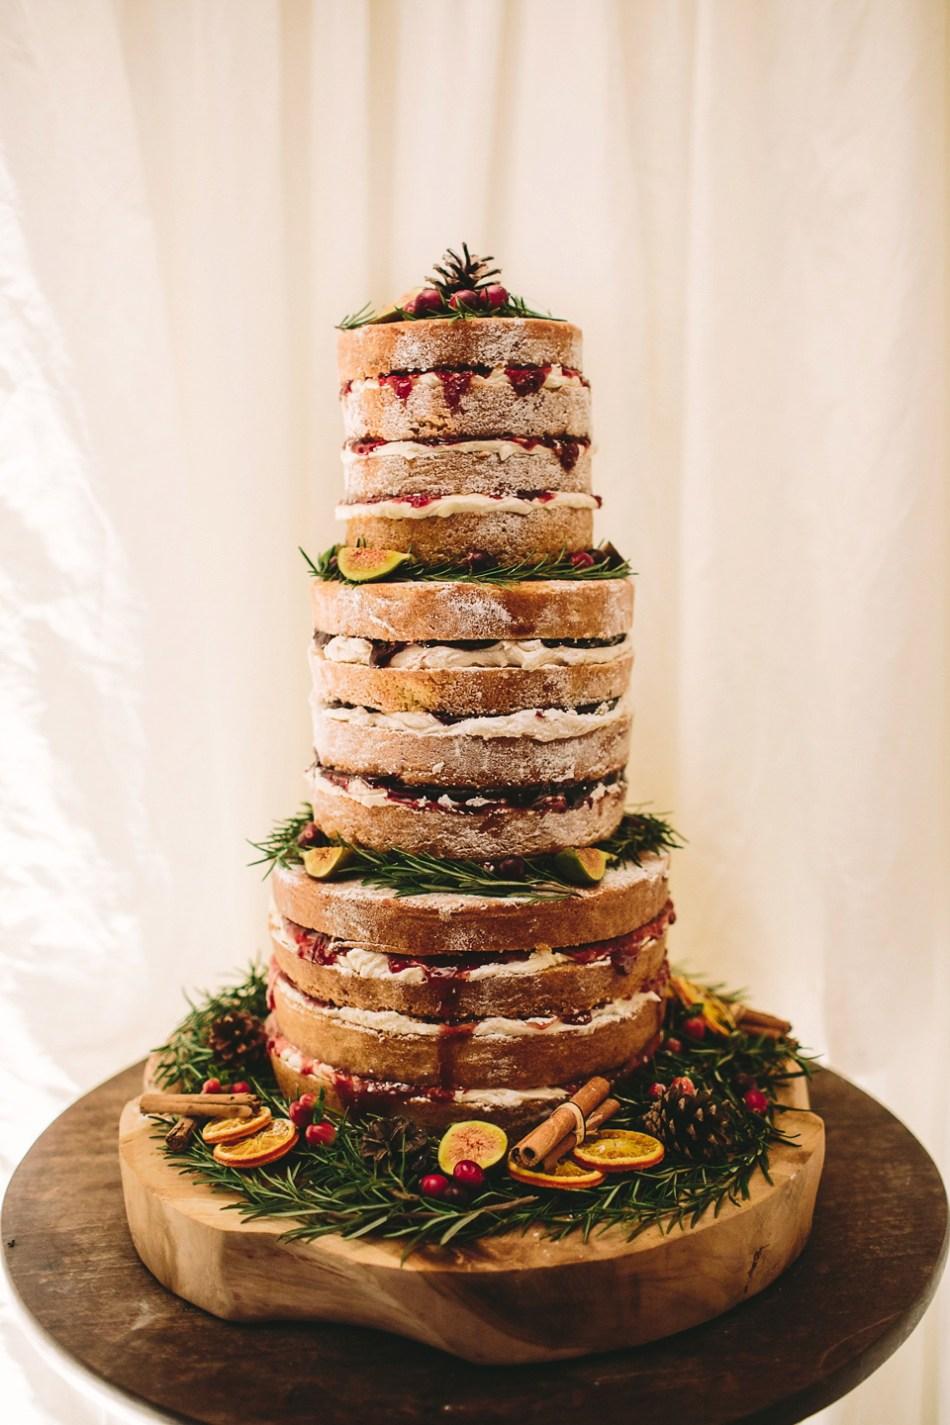 Carols Top Tier Cakes